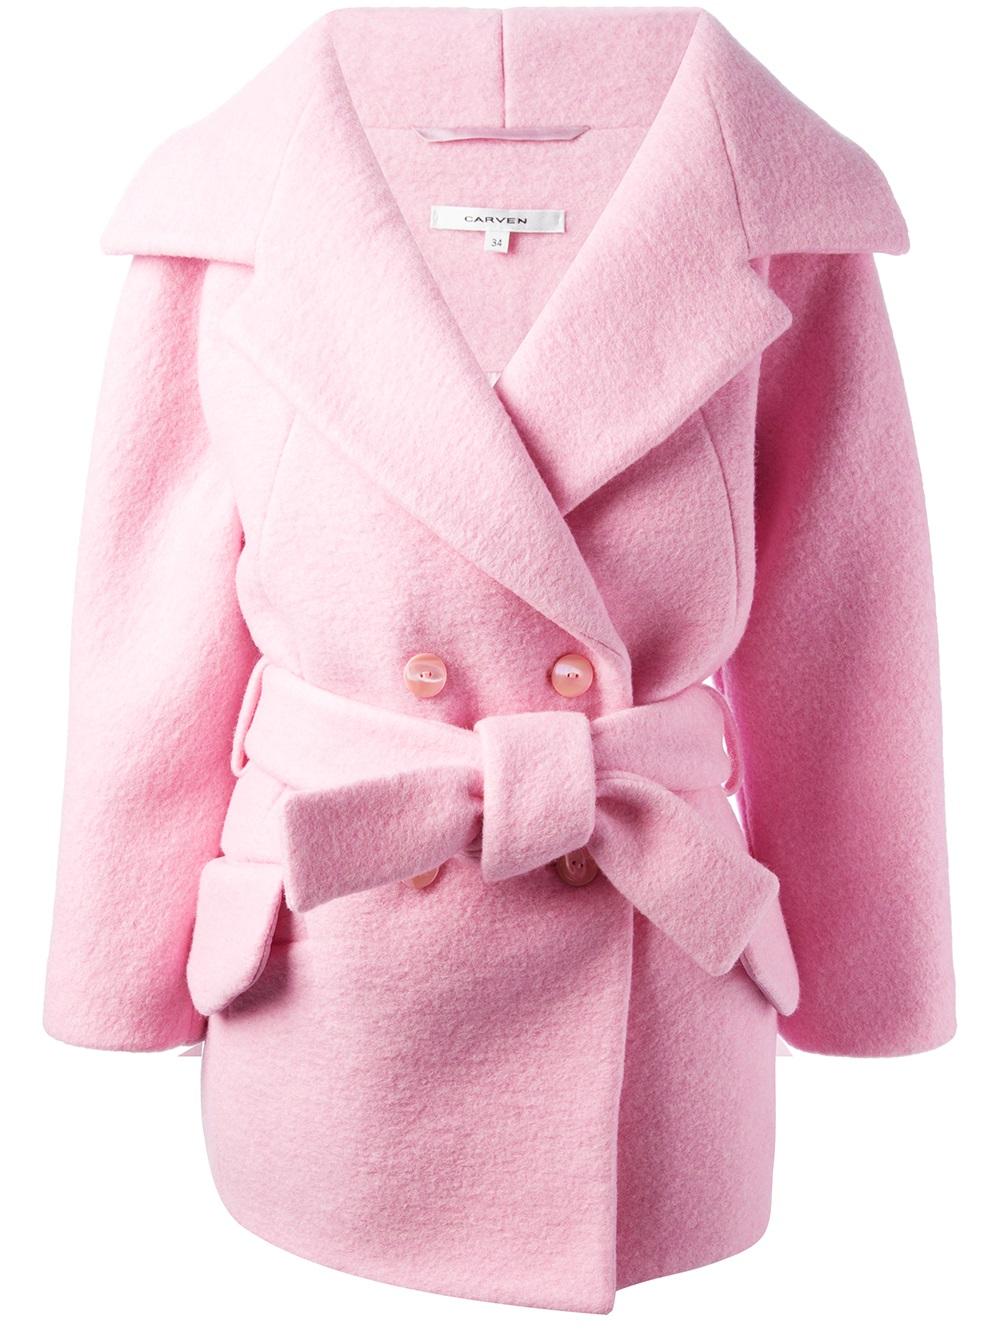 Carven Oversize Belted Coat in Pink | Lyst